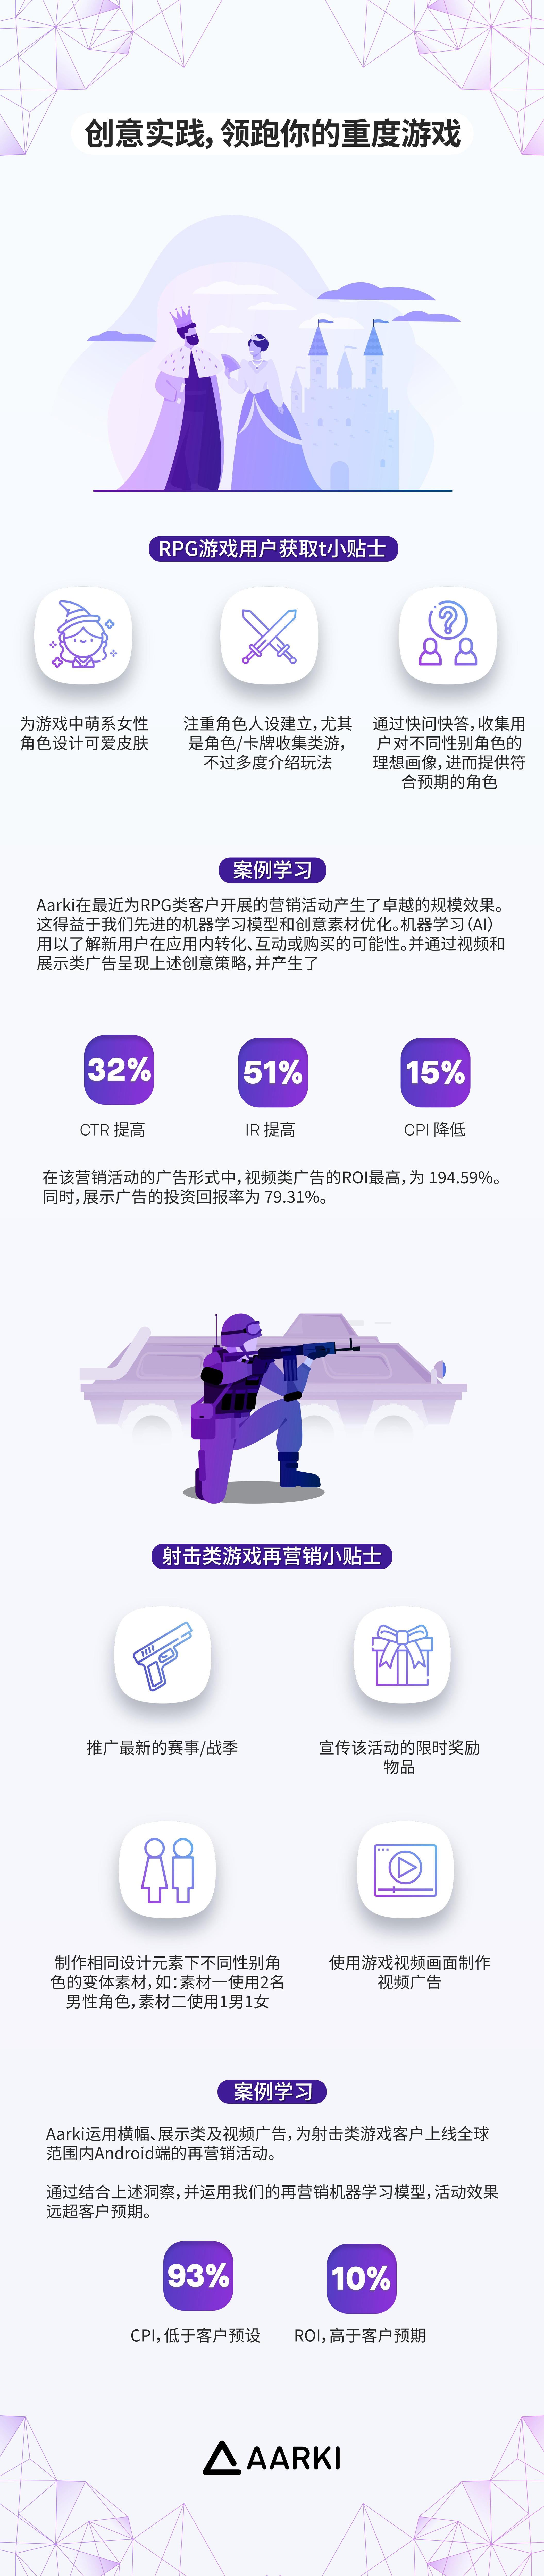 CN_LEVEL UP HARDCORE APPS_Infographic